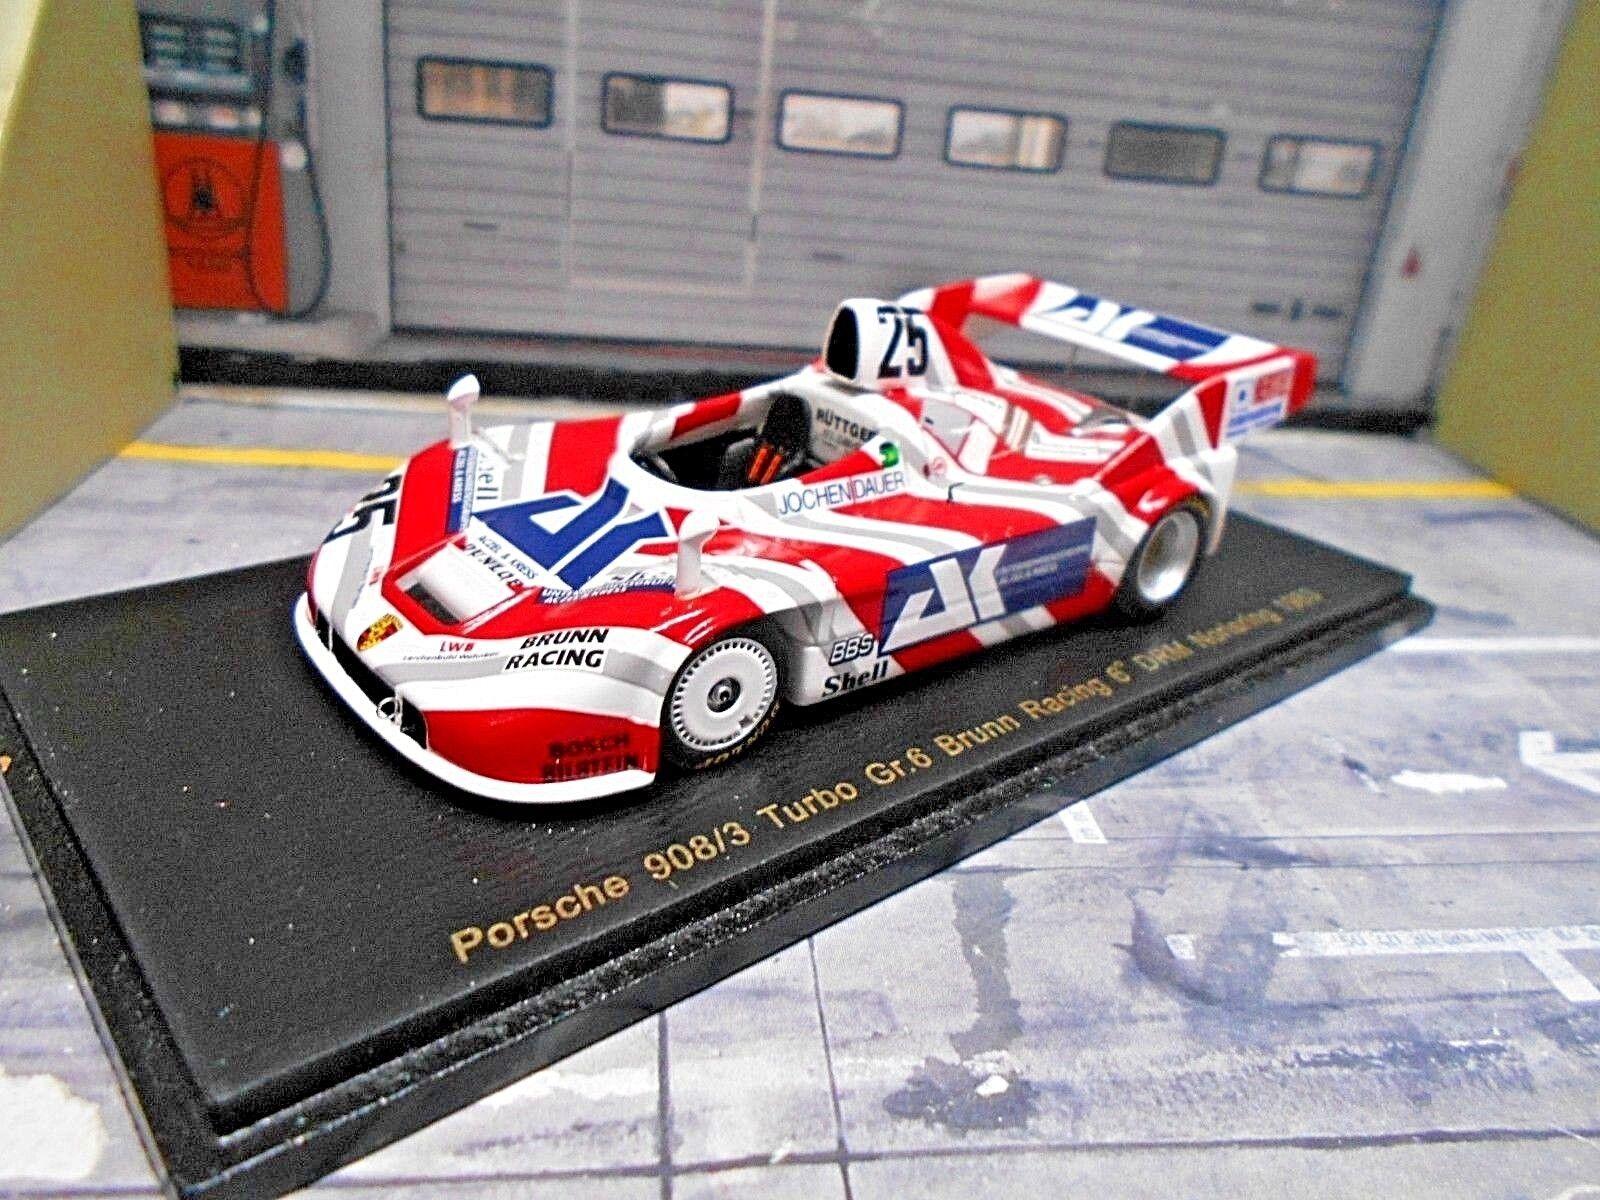 Porsche 908 980 3 Turbo DRM Norisring 1983  25 taille 6 Jesenik durée Resin Spark 1 43